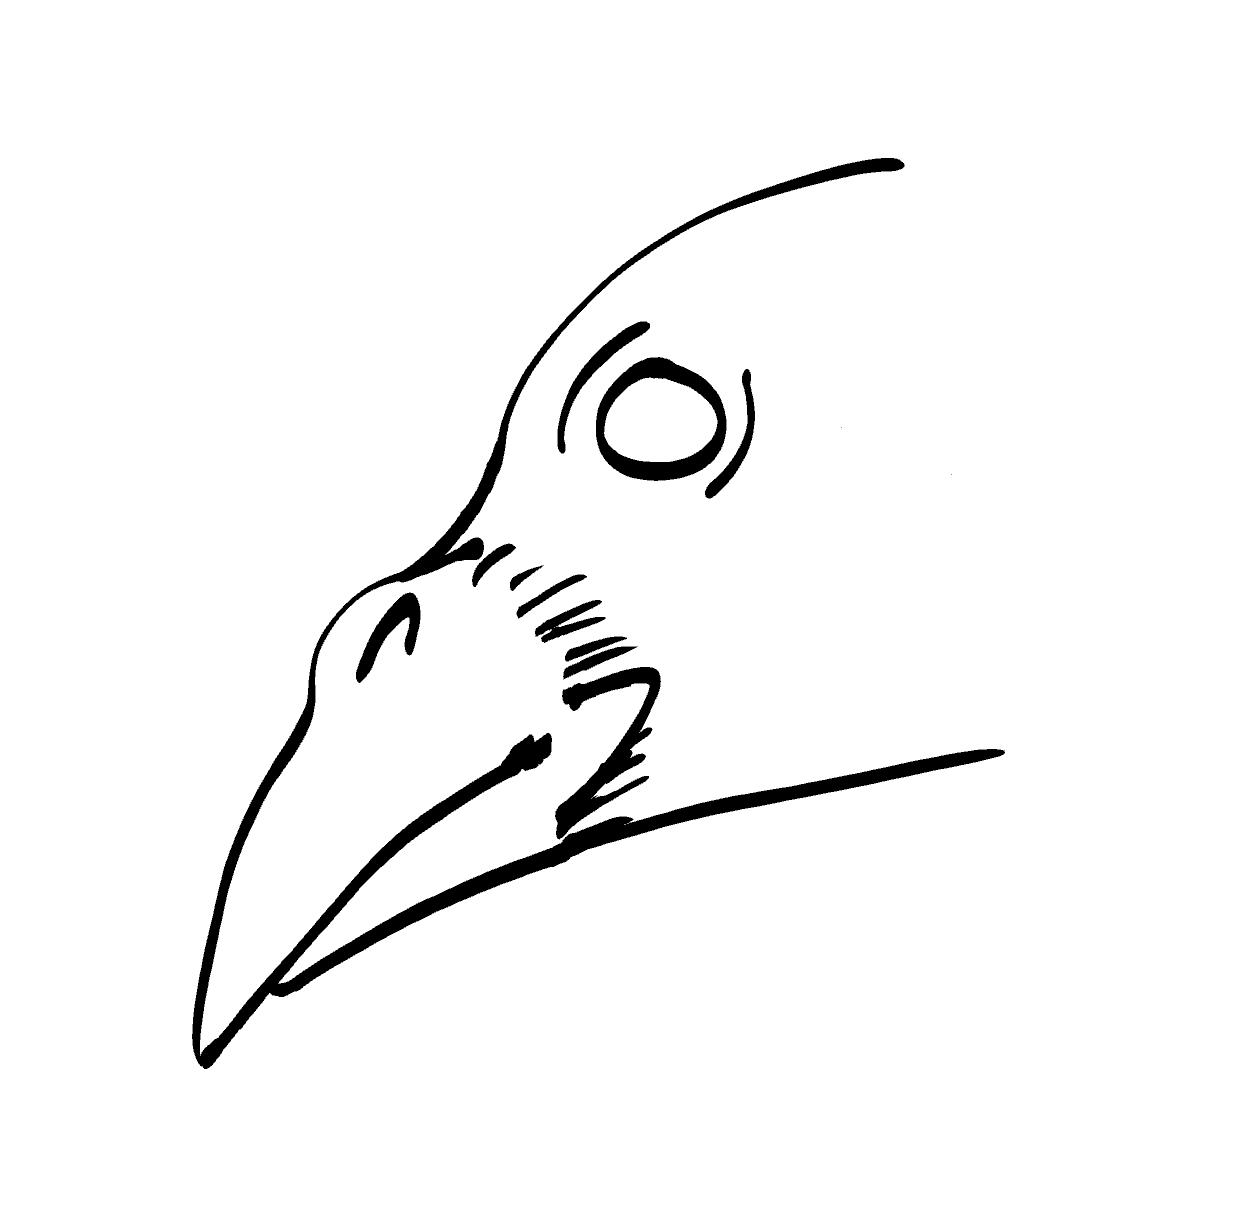 Crow Raven -ukiyo-e BlackandWhite 1 - beak(からす) by RedSparkle (11-2019)